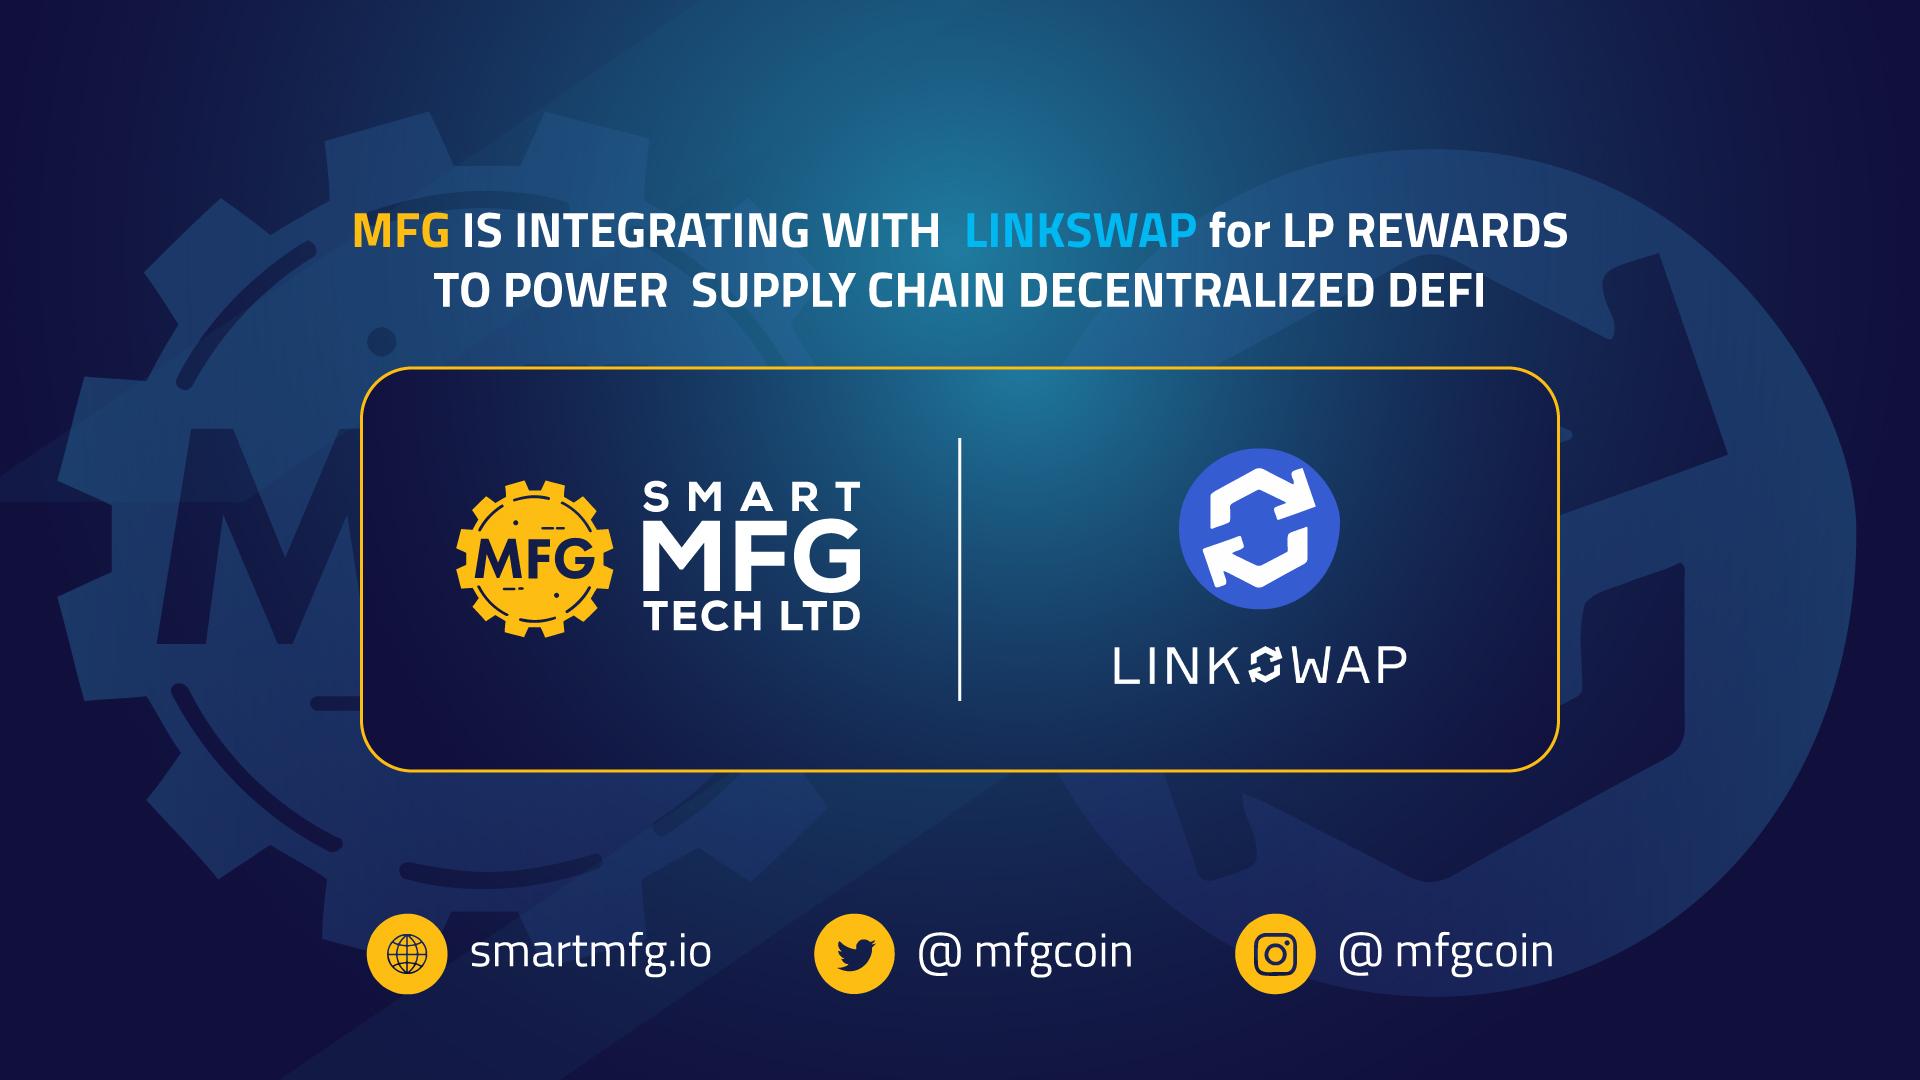 MFG-Linkswap-LP-Rewards-Integration